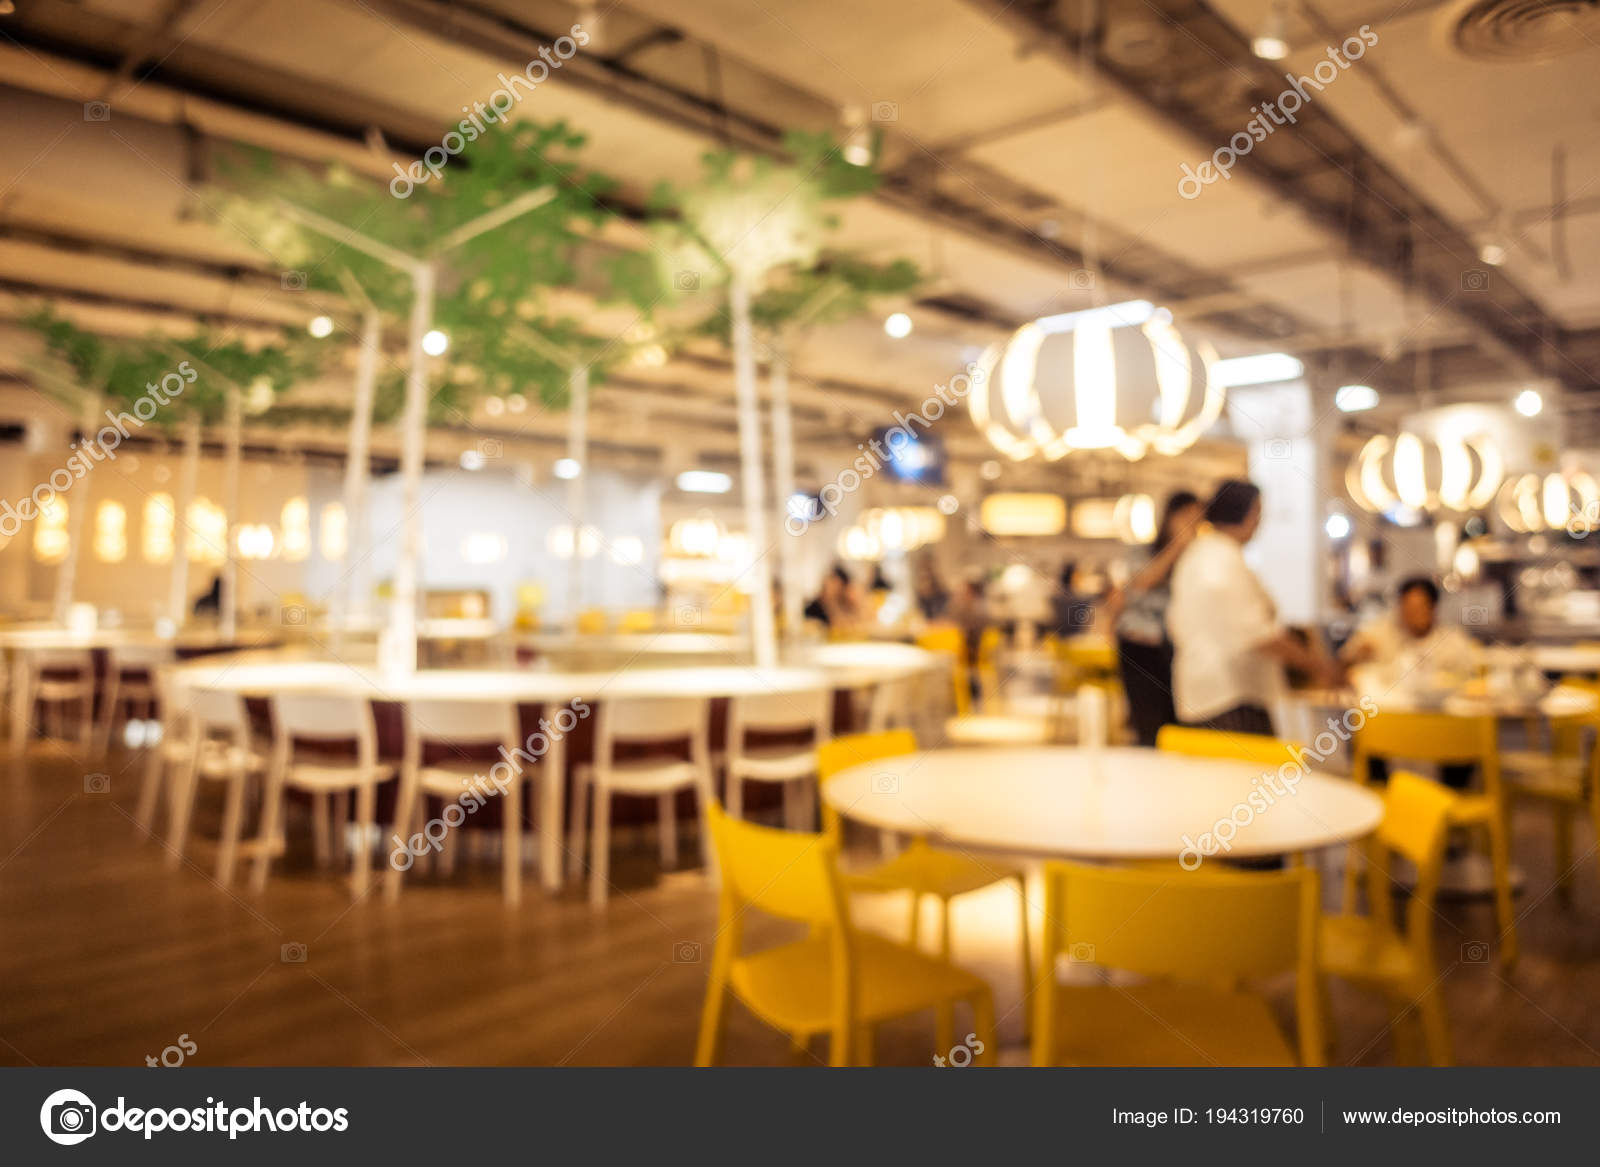 Abstract Blur Defocused Coffee Shop Cafe Restaurant Interior Background Stock Photo C Mrsiraphol 194319760